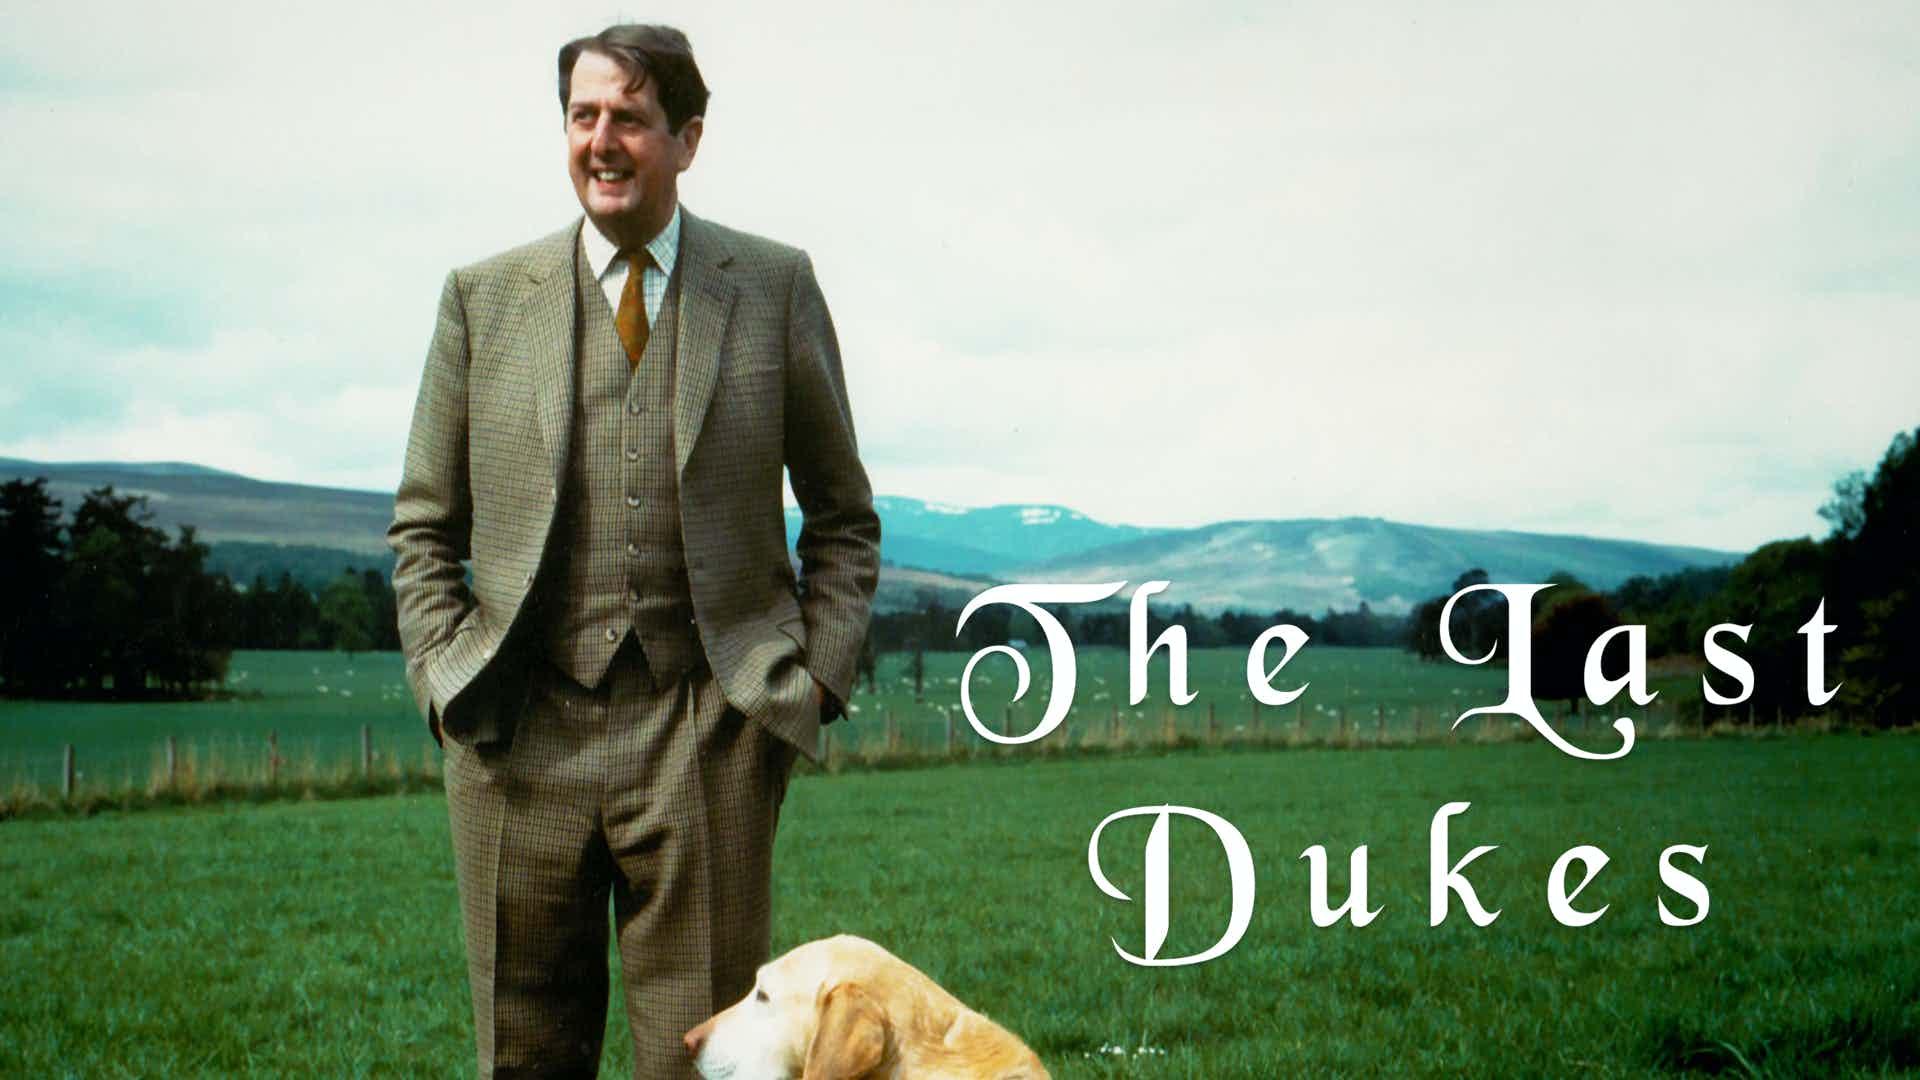 Modern Times: The Last Dukes